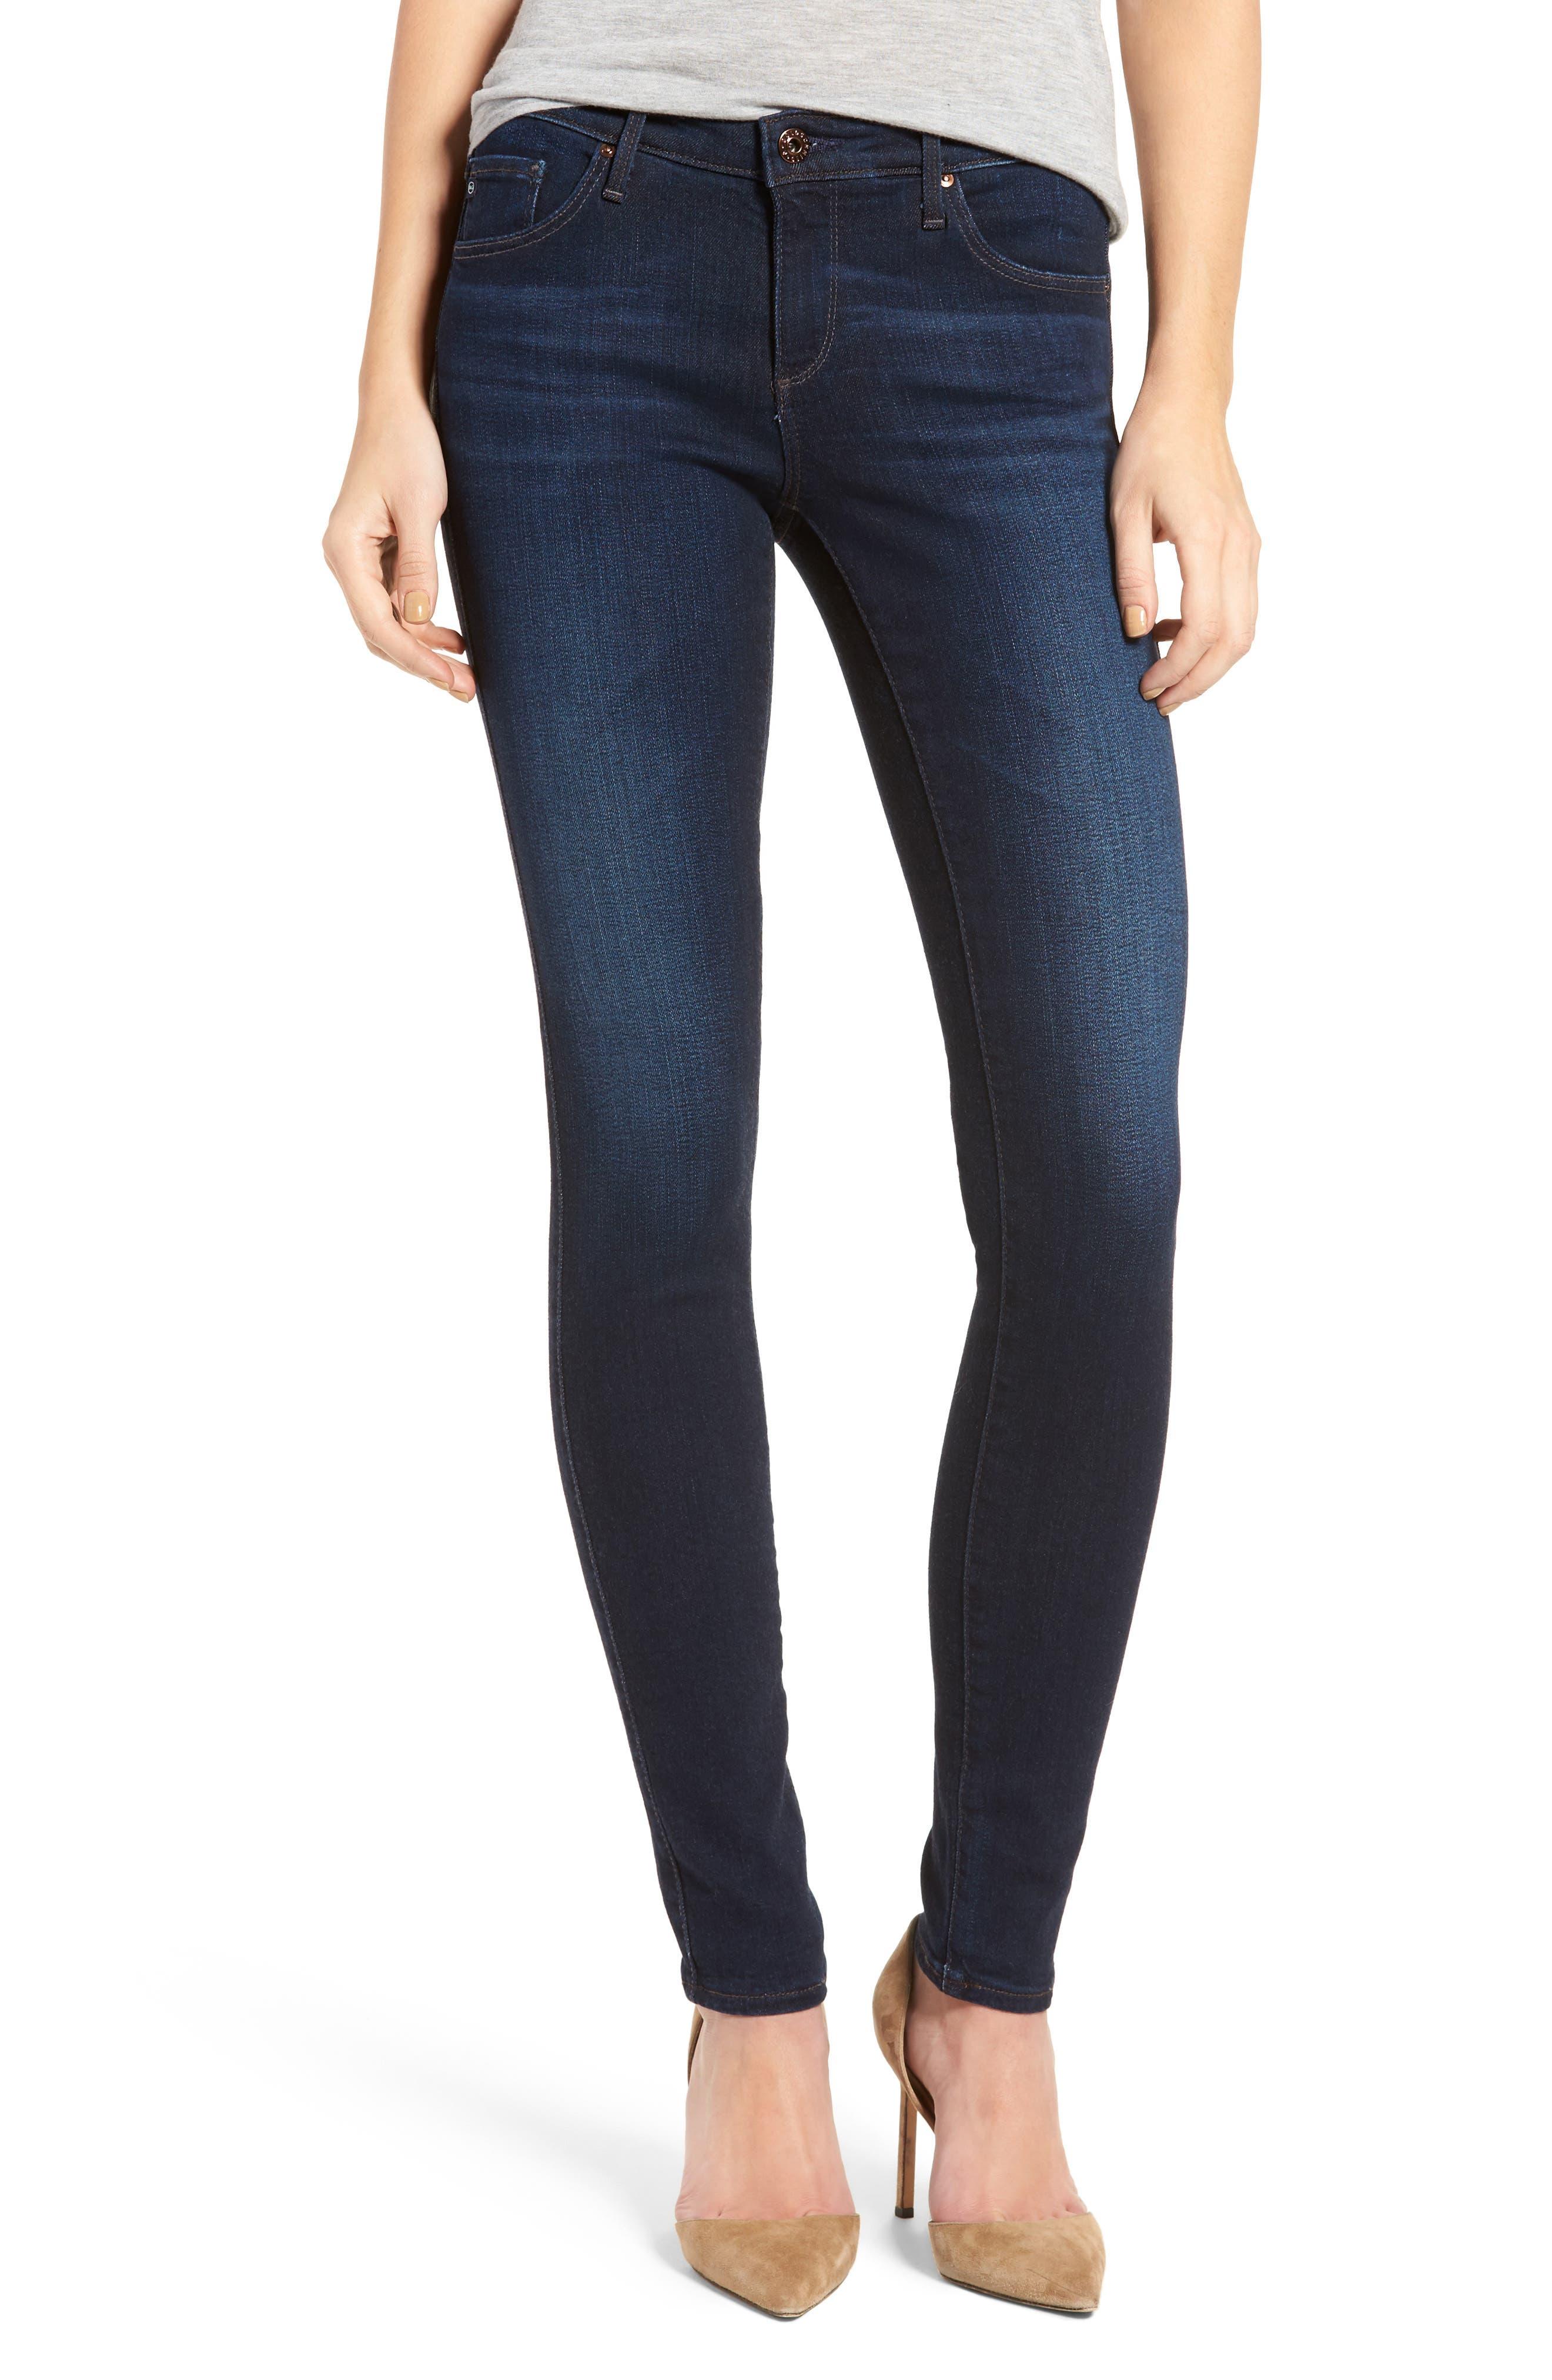 Alternate Image 1 Selected - AG Jeans Super Skinny Stretch Jeans (Jetsetter)